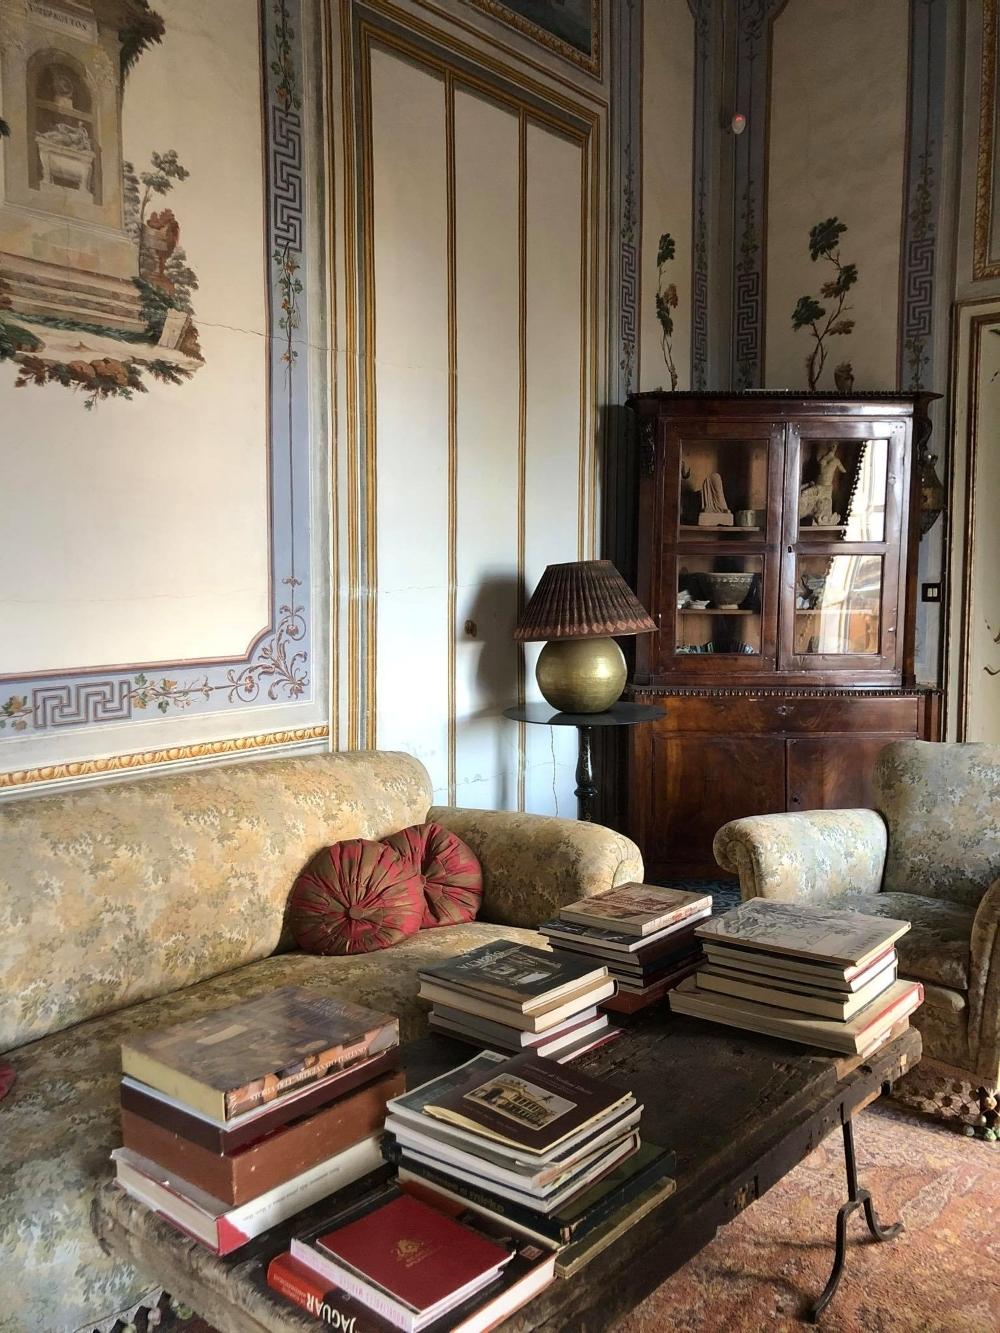 rocaille-blog-villa-valguarnera-bagheria-sicilia-sala-algarotti-5